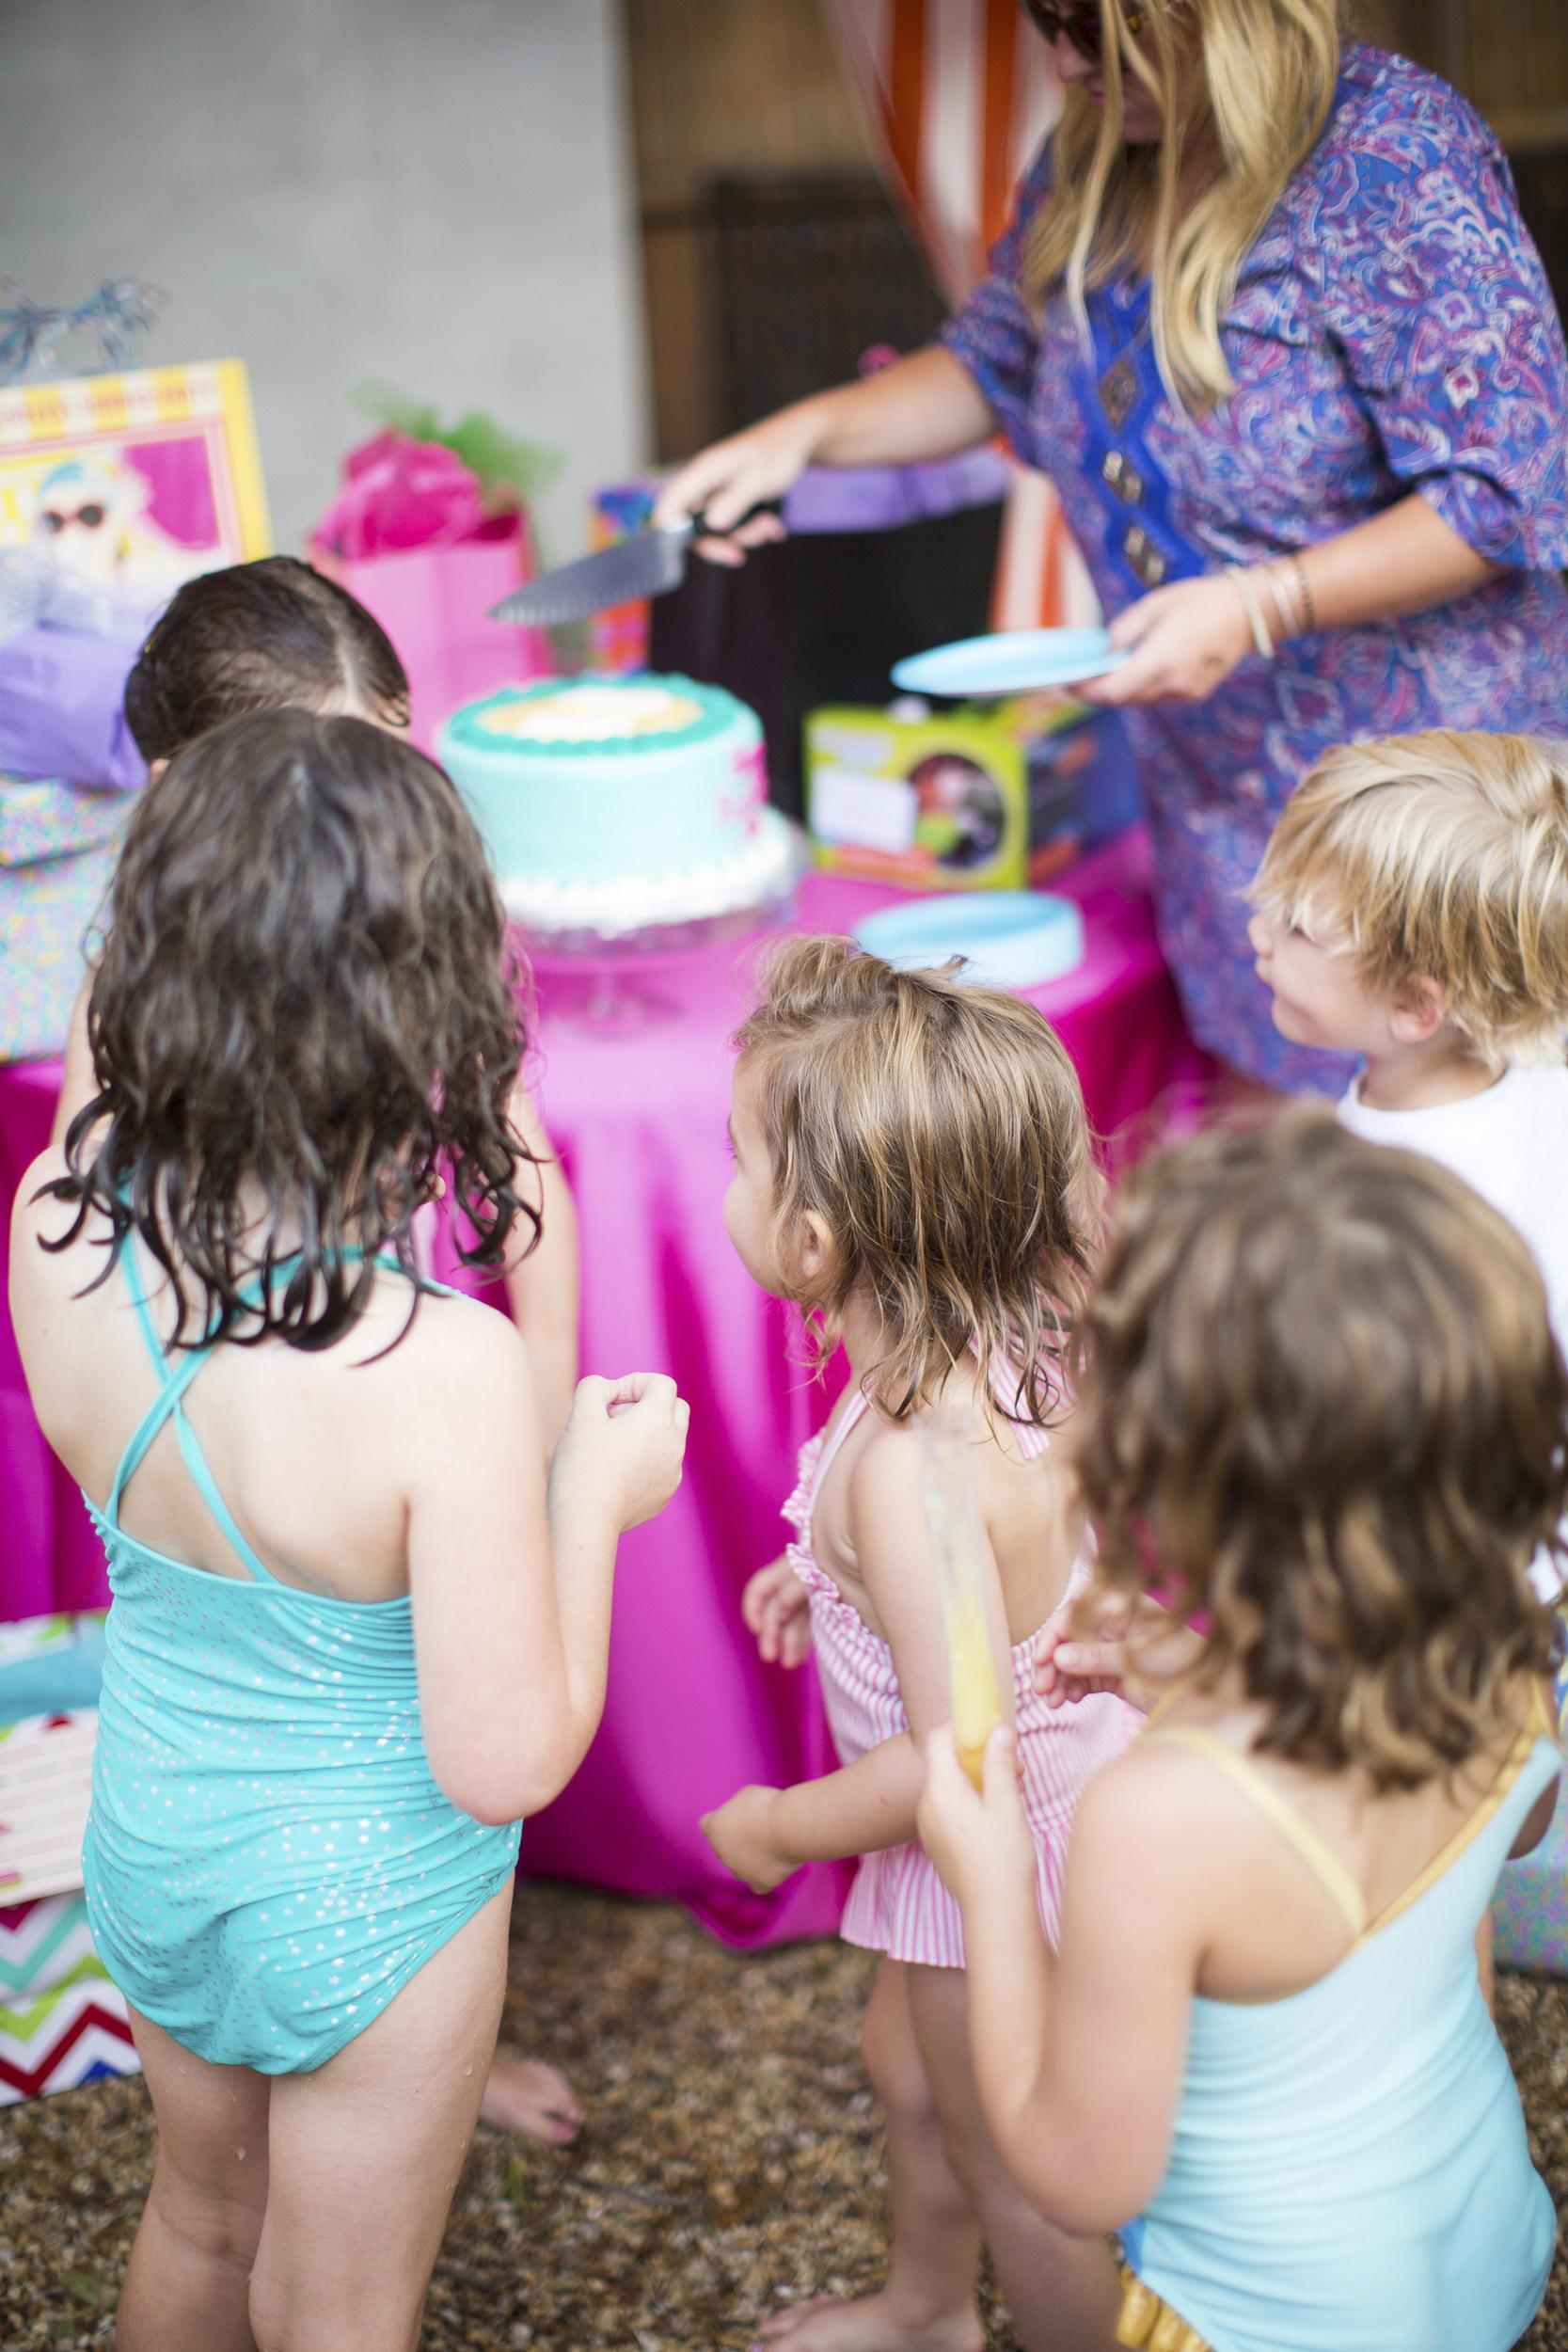 dallas_texas_birthday_party_mae_emily_clarke_events_kids_retro_pool_swim_endless_summer_invitations_ceci_new_york_watercolor_illustration_decor-14.jpg